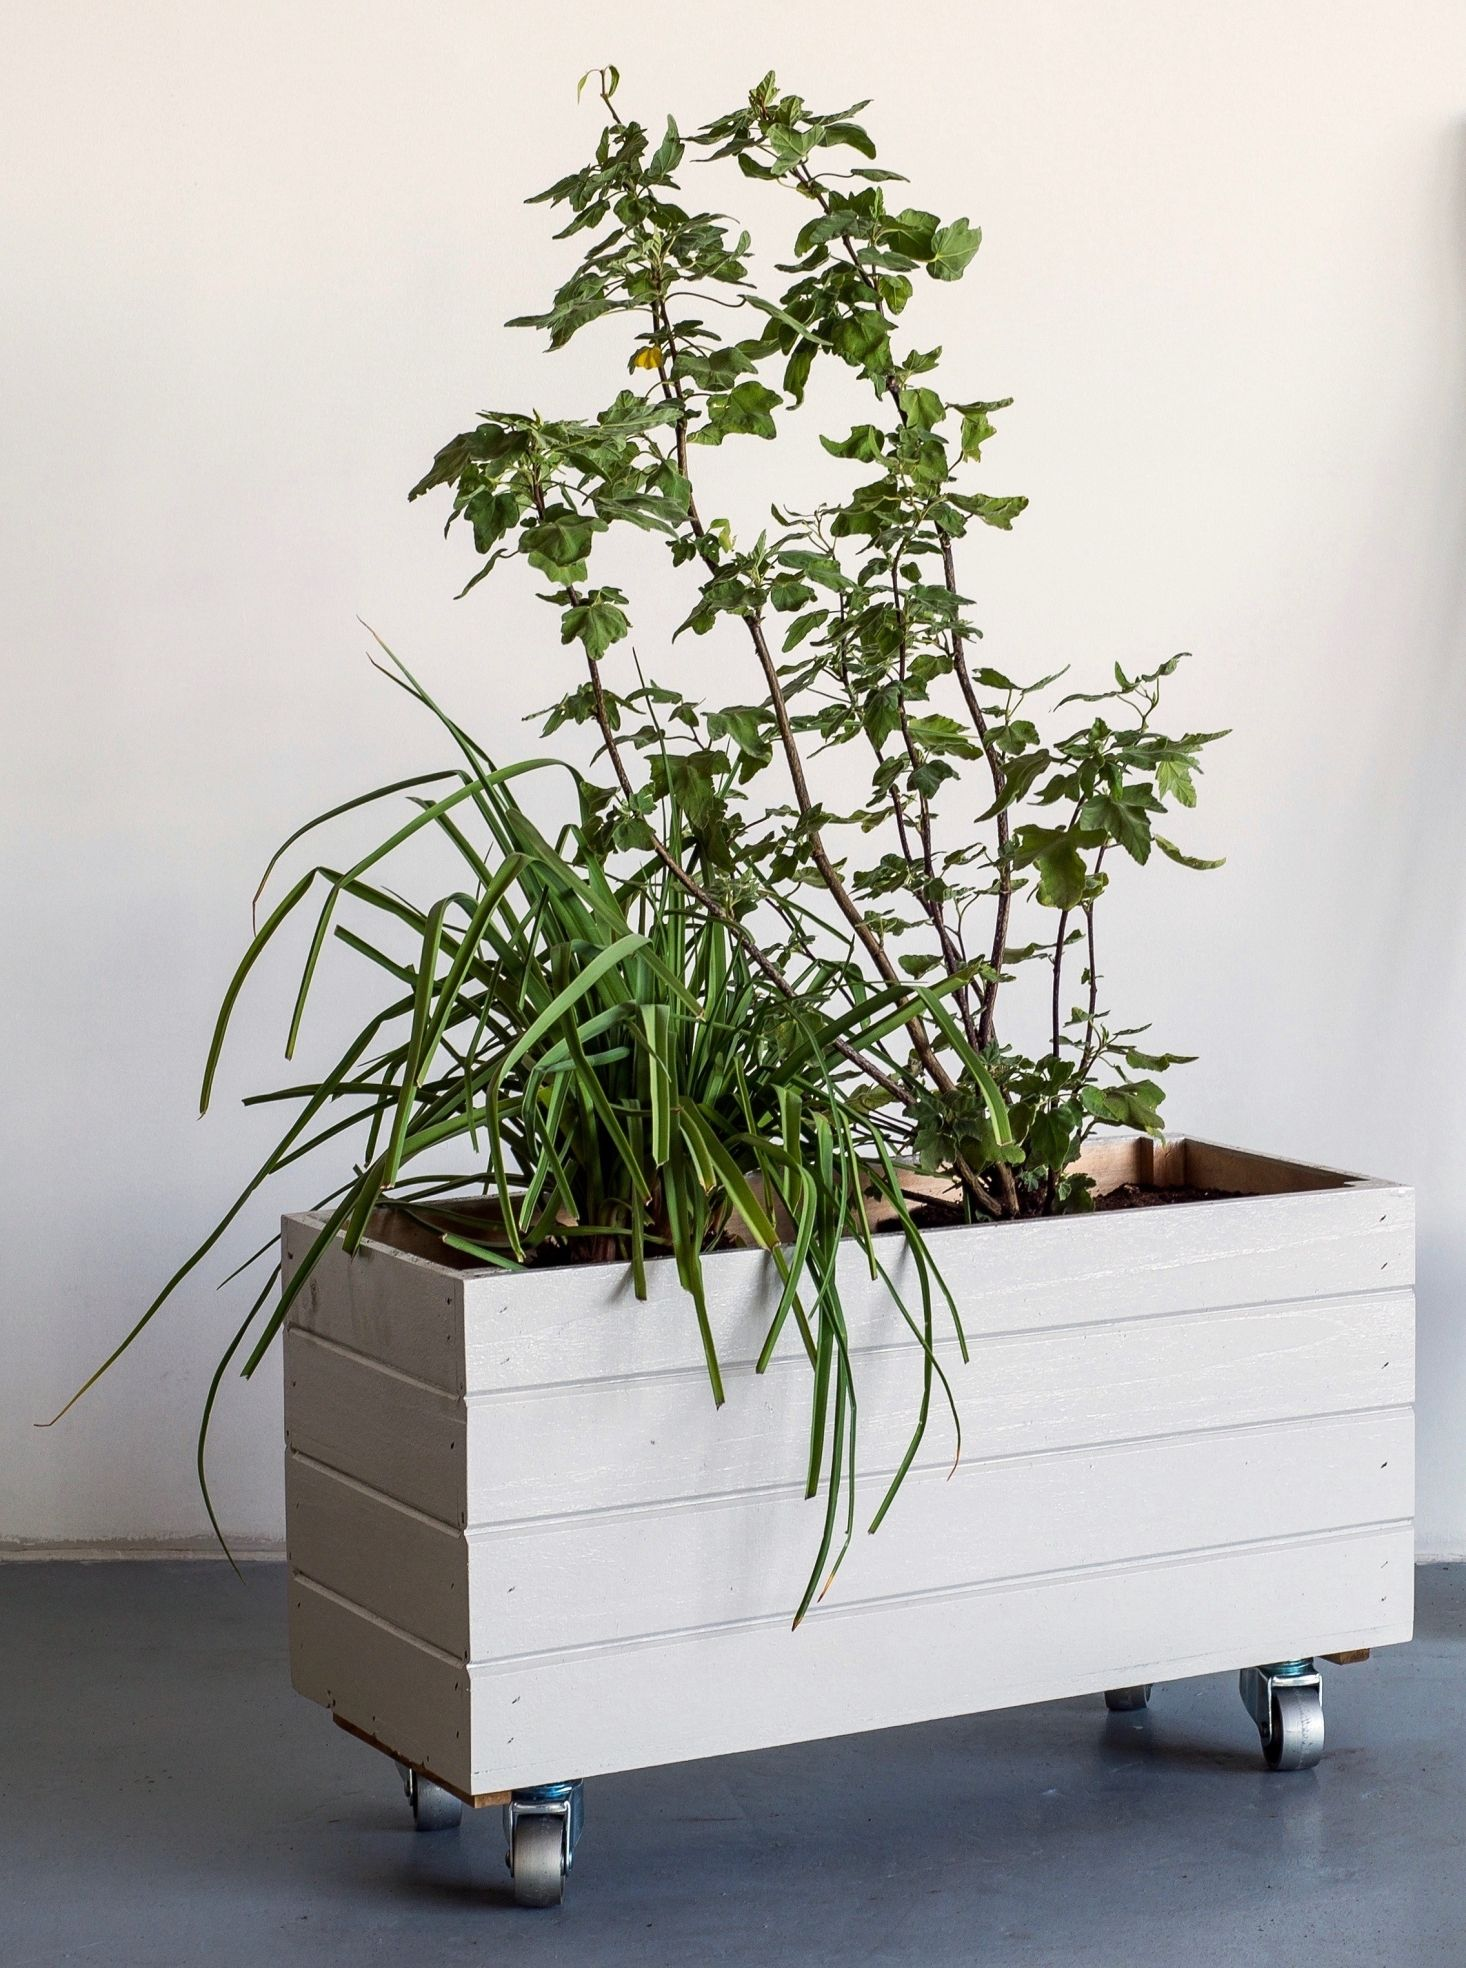 Container gardening a diy planter on wheels diy